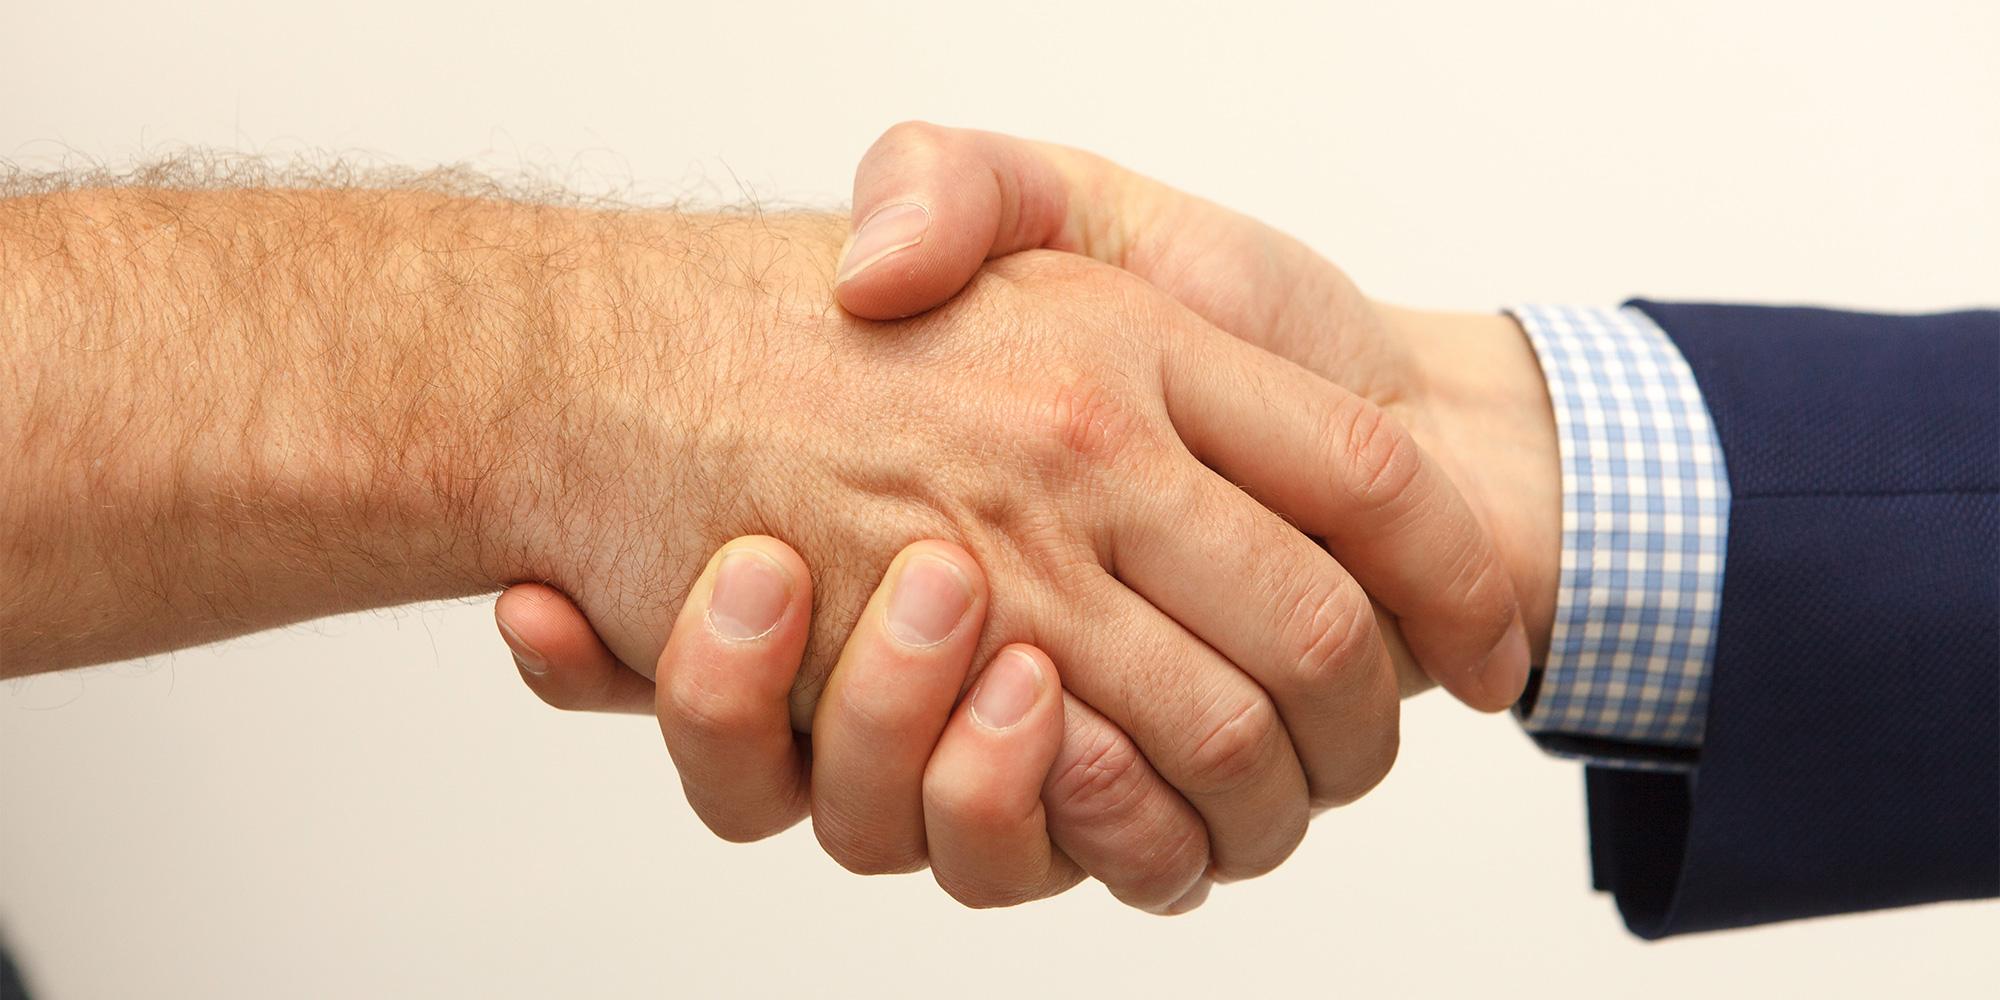 "<span>Photo by <a href=""https://unsplash.com/@conniwenningsimages?utm_source=unsplash&amp;utm_medium=referral&amp;utm_content=creditCopyText"">Constantin Wenning</a> on <a href=""https://unsplash.com/s/photos/handshake?utm_source=unsplash&amp;utm_medium=referral&amp;utm_content=creditCopyText"">Unsplash</a></span>"